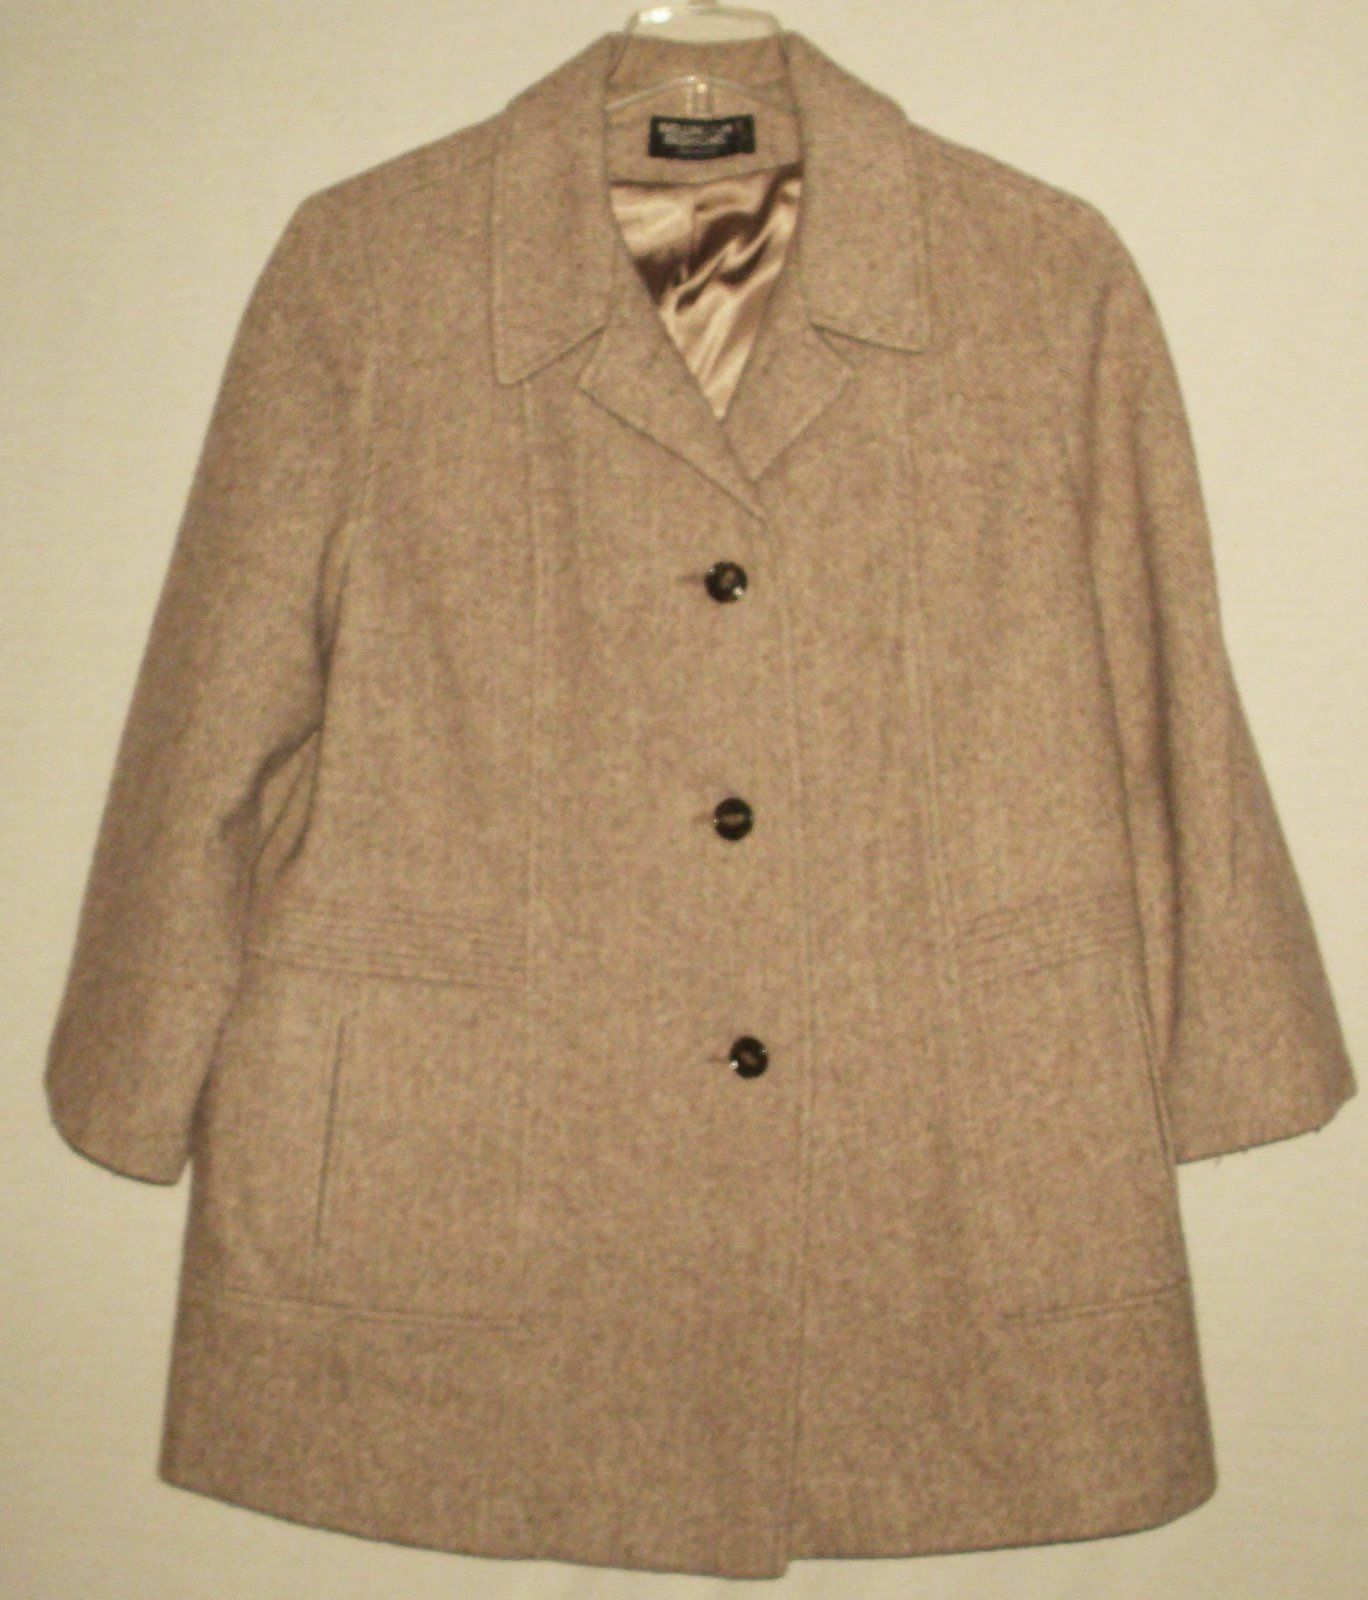 Trench Car Coat Womens Sz M Wellington Fashions Tan Herringbone Wool Blend USA